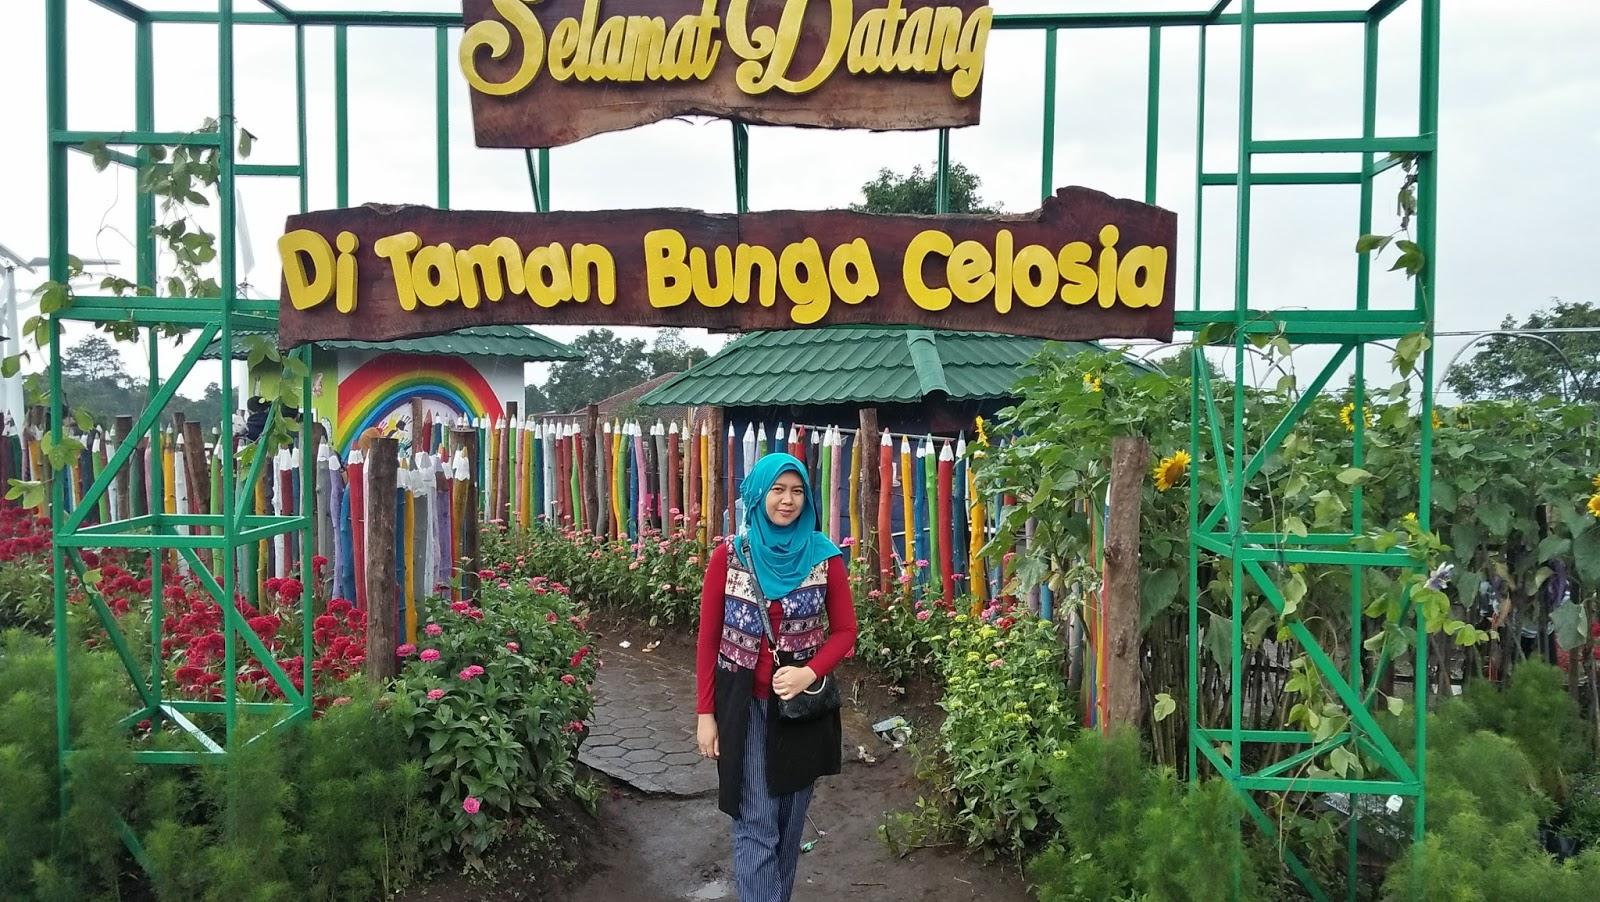 Taman Bunga Celosia Bandungan Rasa Luar Negeri Warna Warni